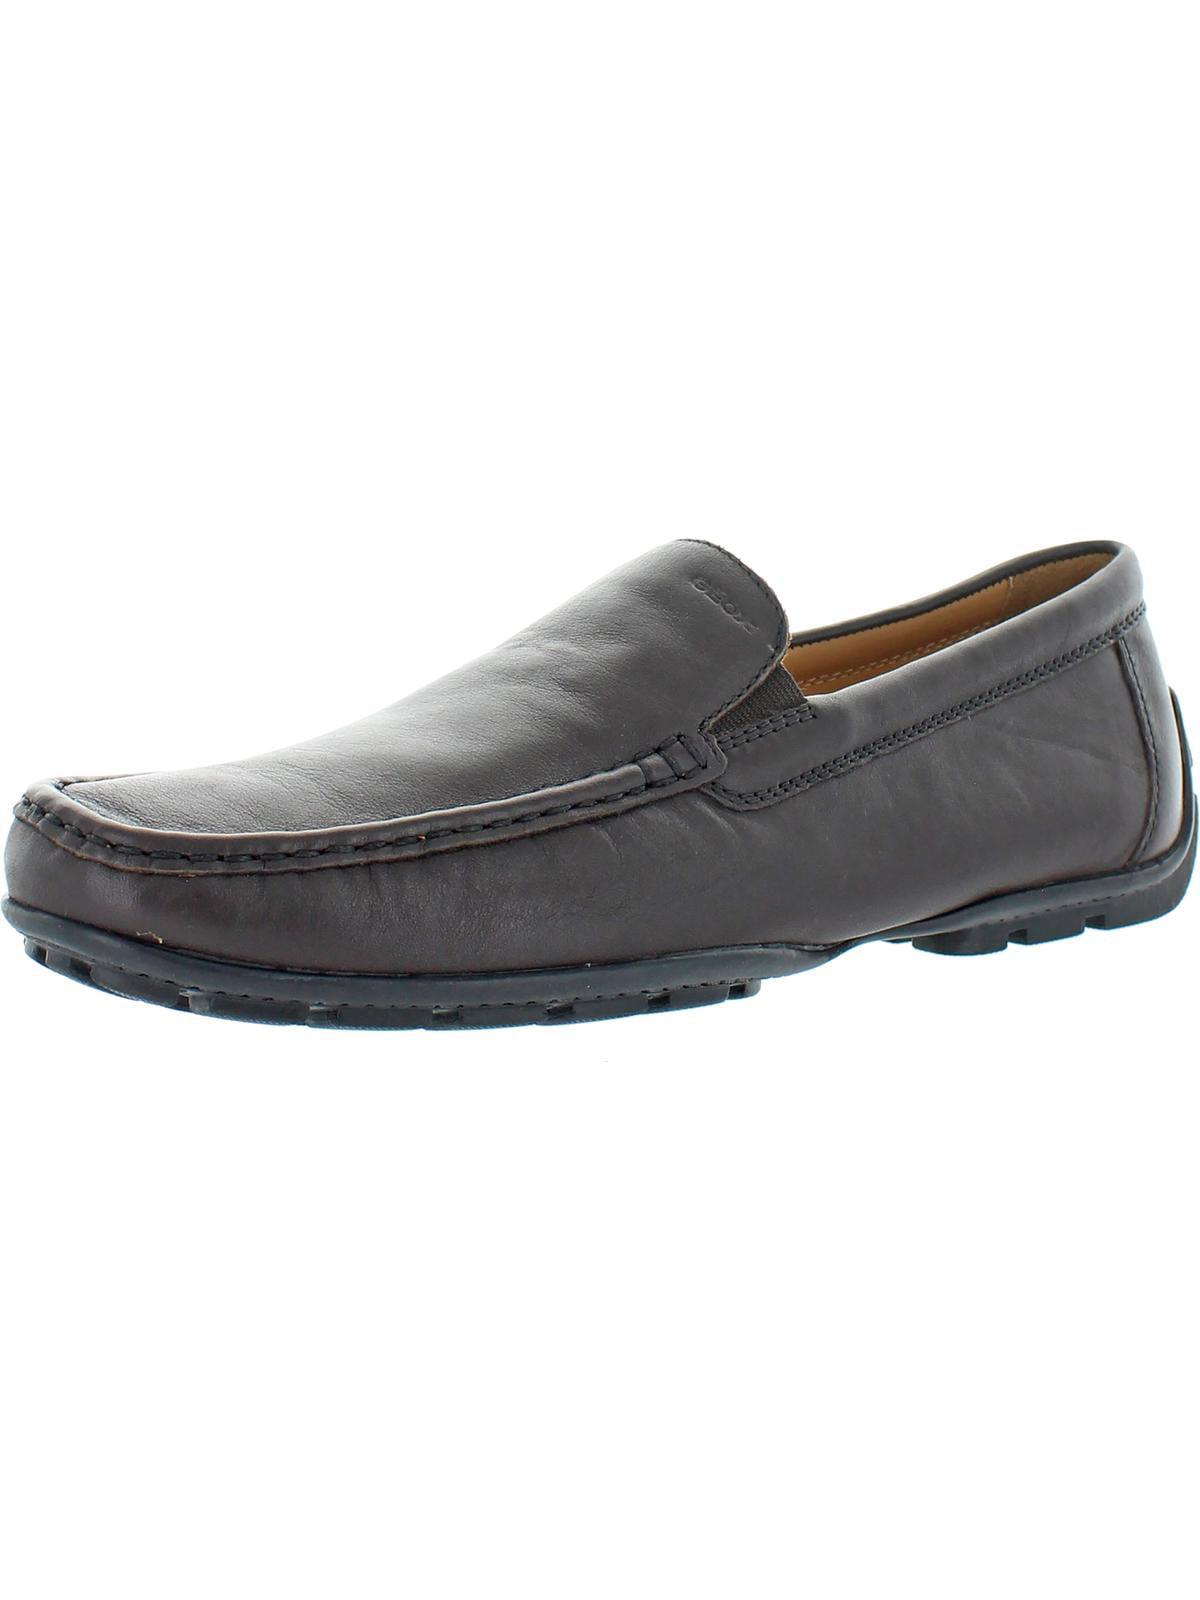 Geox Mens Shoes - Walmart.com